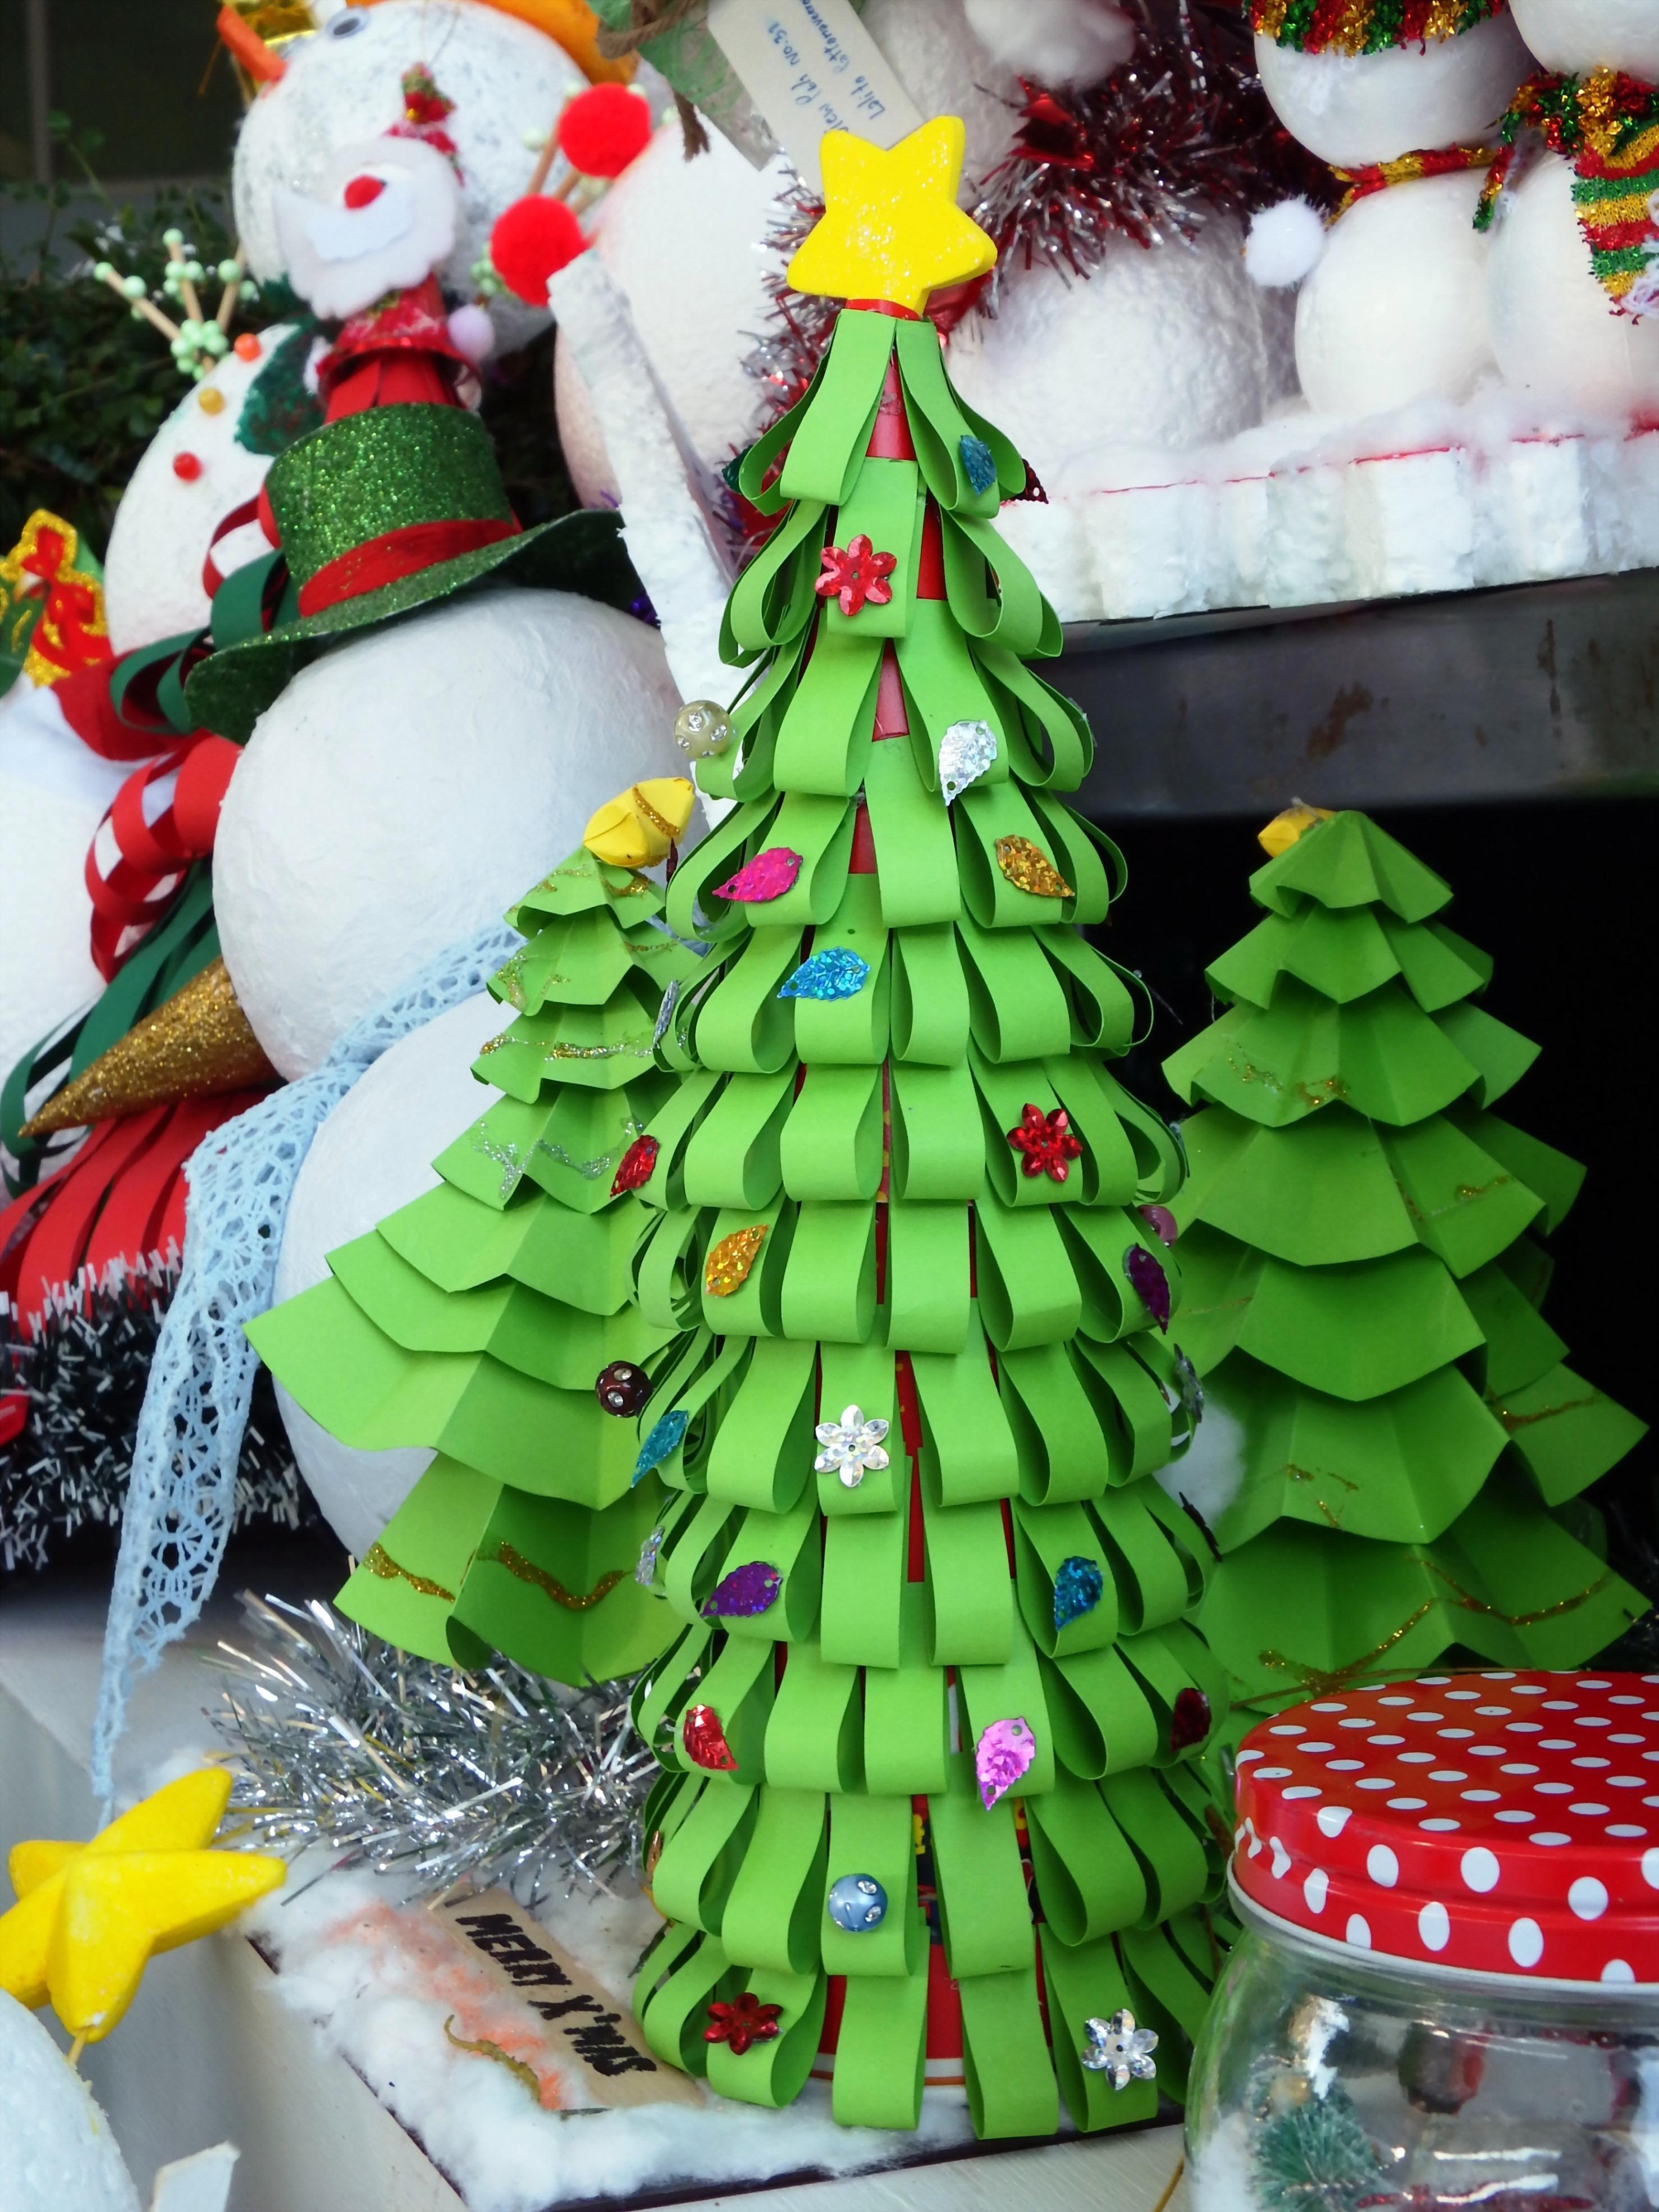 Paper craft Christmas tree, Cotton, Cottonwool, Craft, Decoration, HQ Photo